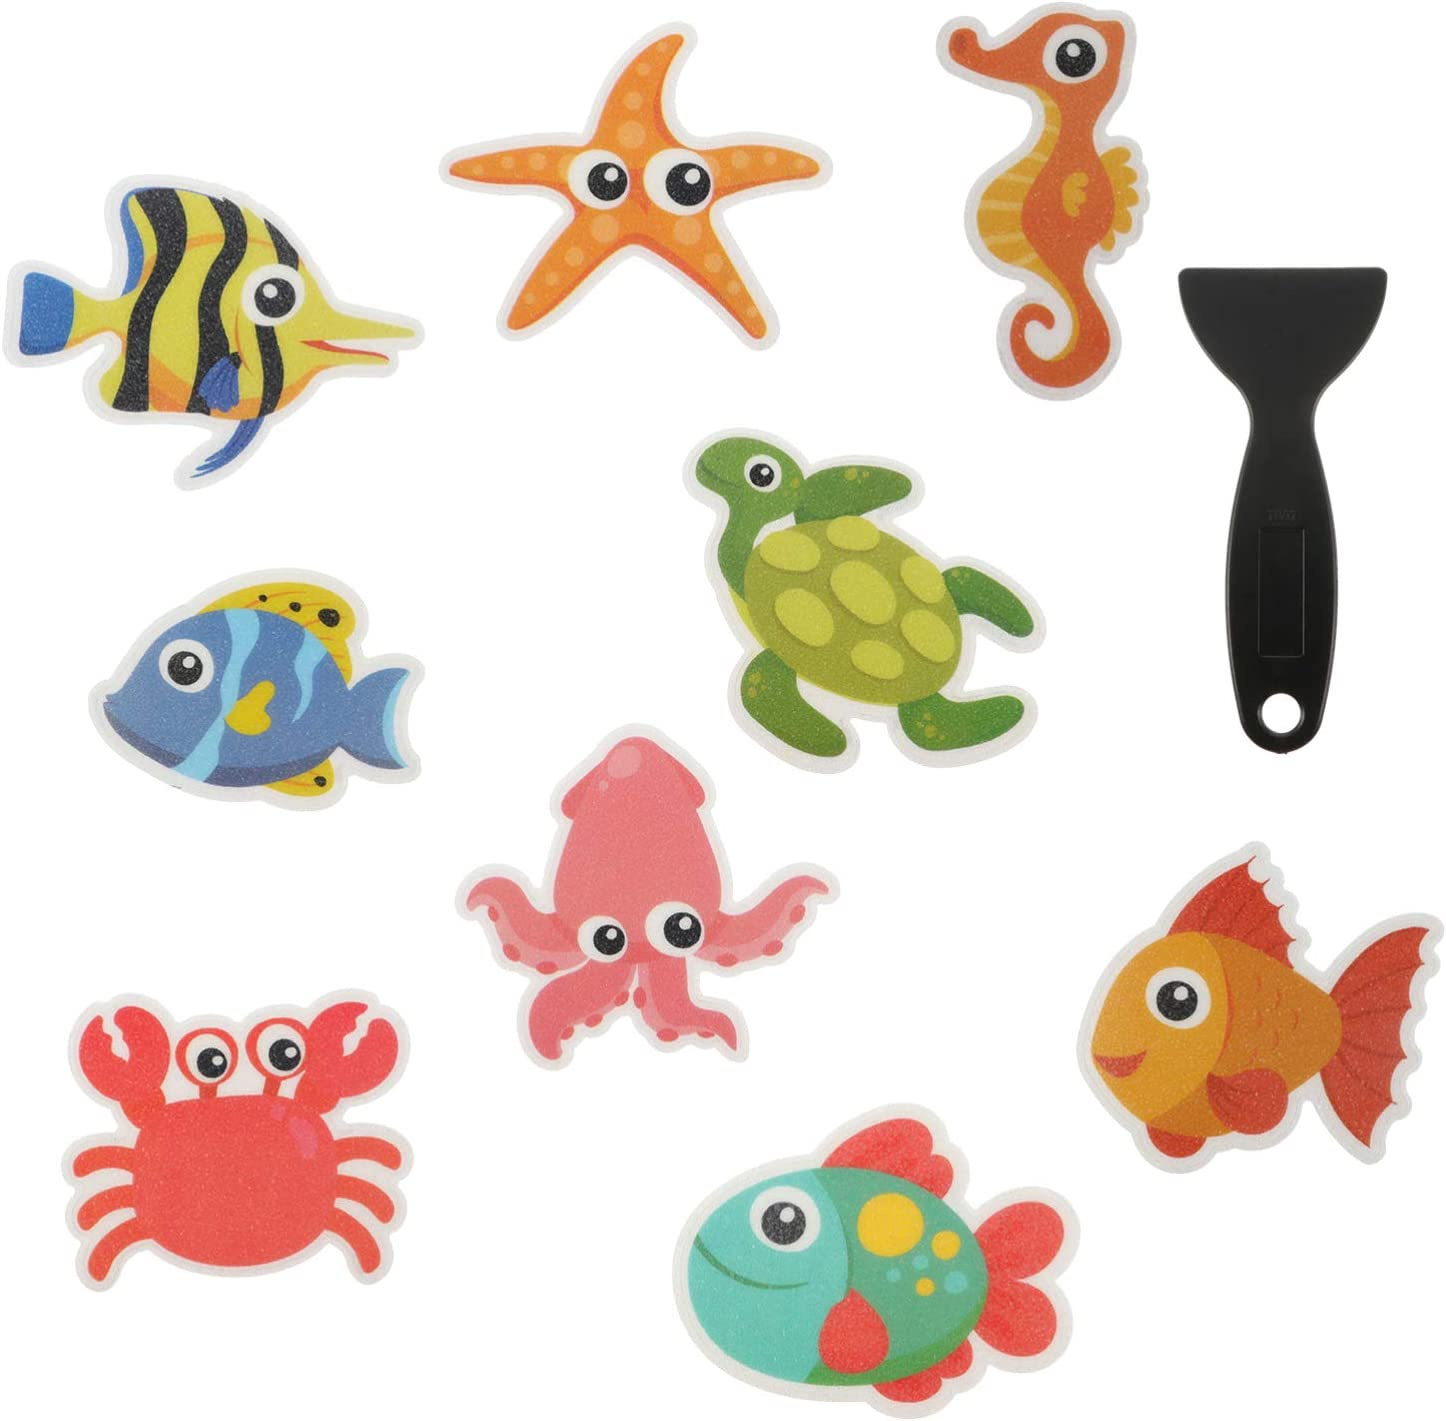 HEMOTON Non Slip Sales Bathtub Stickers Adhe Creature Las Vegas Mall Treads Decal Sea